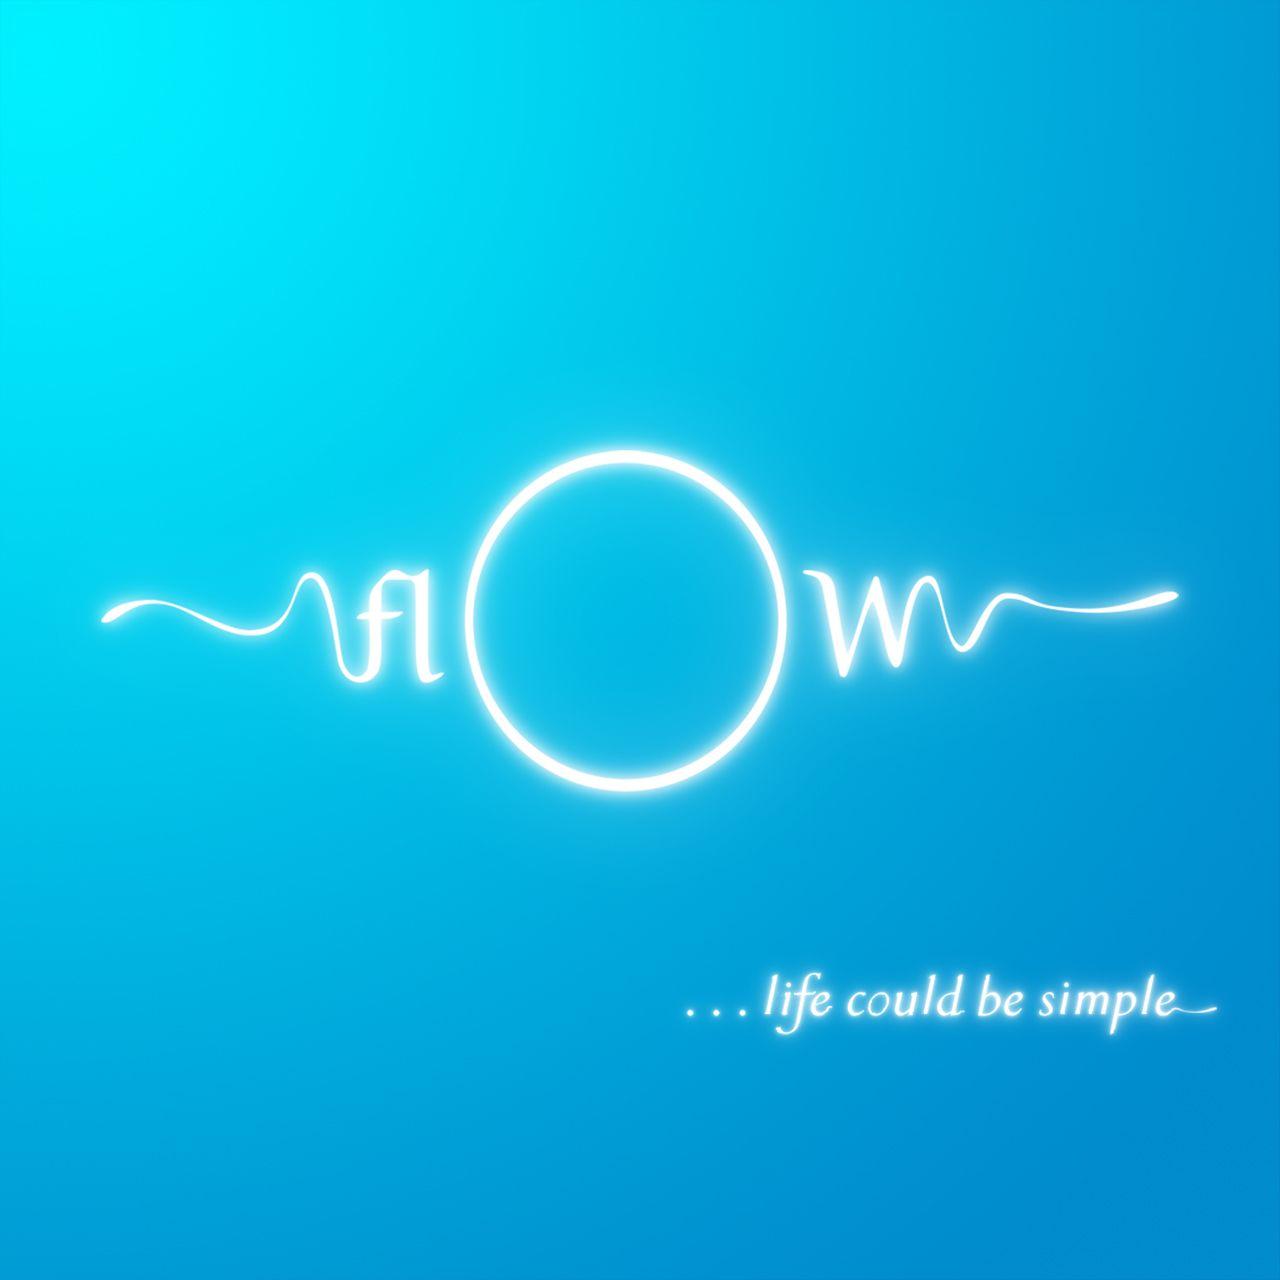 Flow (2006)